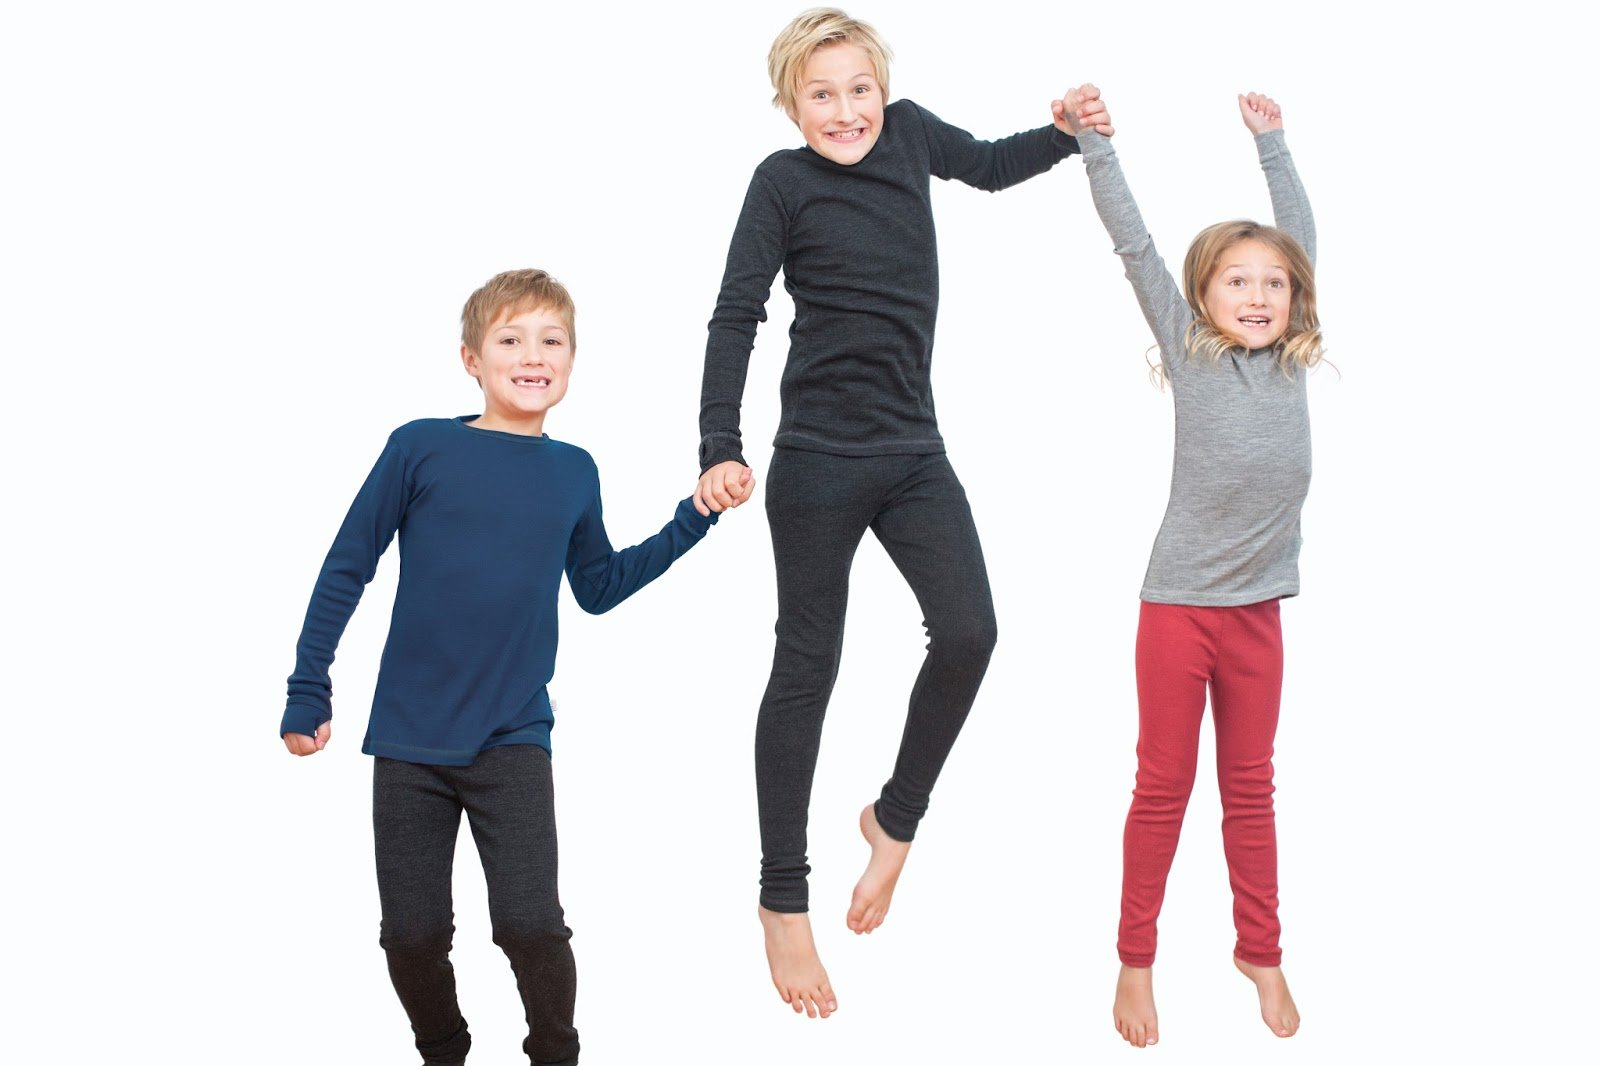 Pure Merino Wool Kids Thermal Top. Base layer Underwear Pajamas. BLUE 9-10 Yrs by Simply Merino (Image #3)